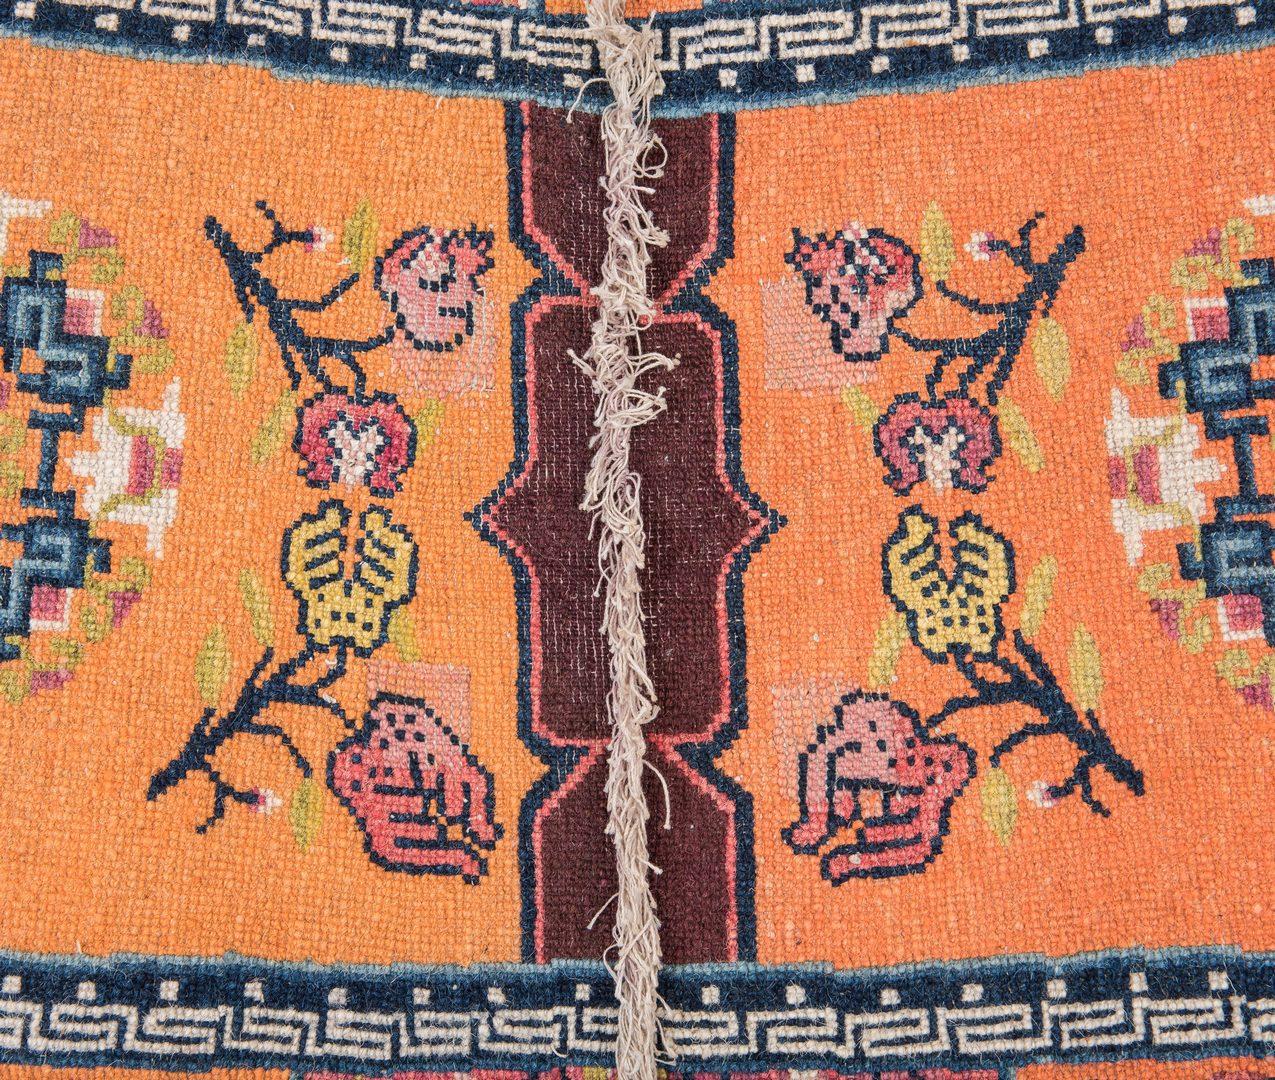 Lot 657: Mongolian Saddle Rug, 1st quarter 20th c.